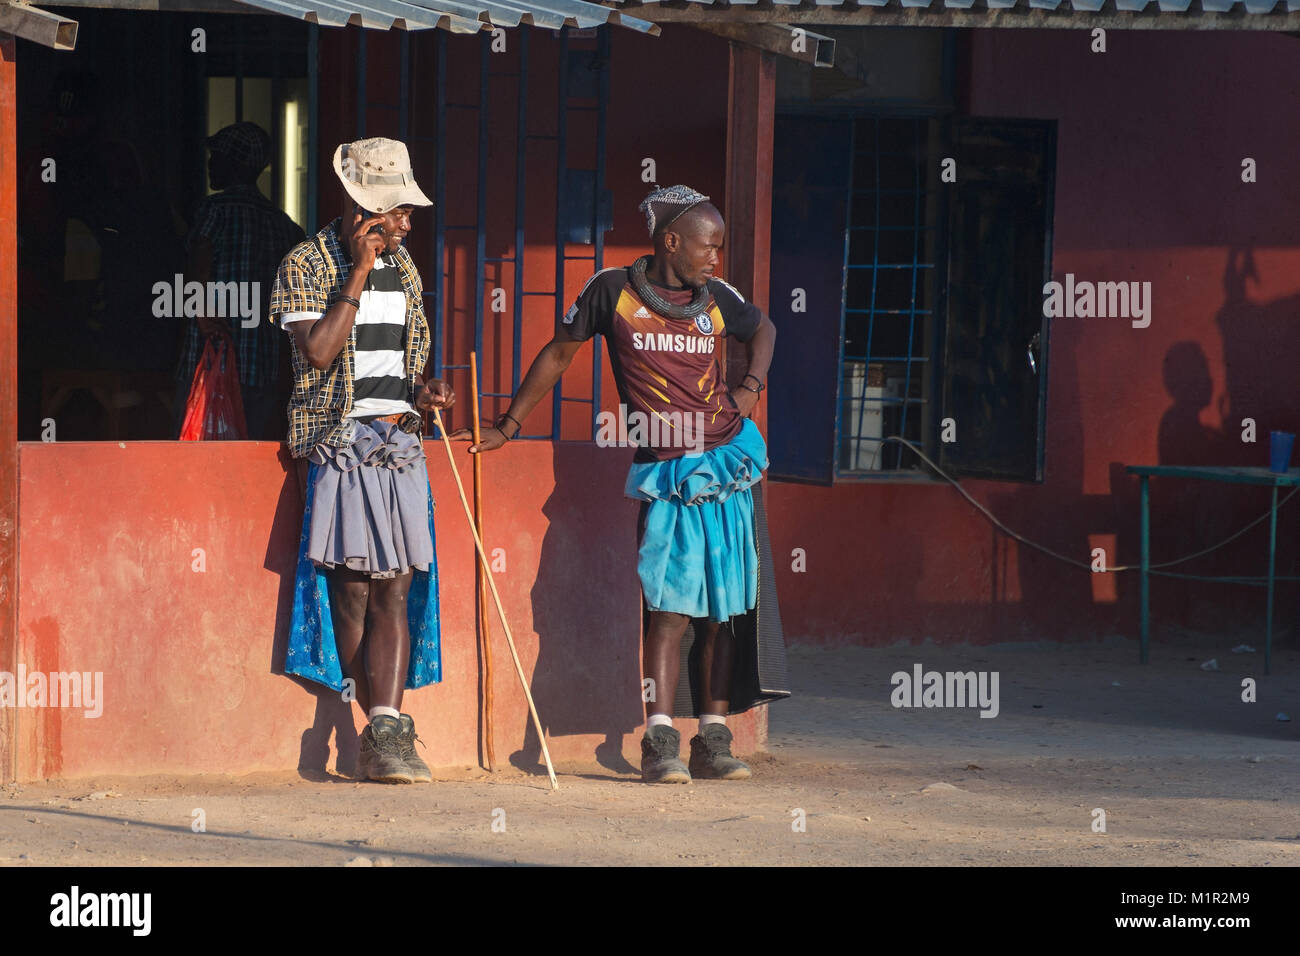 People, Himba, man, Opuwo, Namibia, Himba menMenschen man, Opuwo, Namibia, Himba Himba Men Men, Namibia  menMenschen, - Stock Image